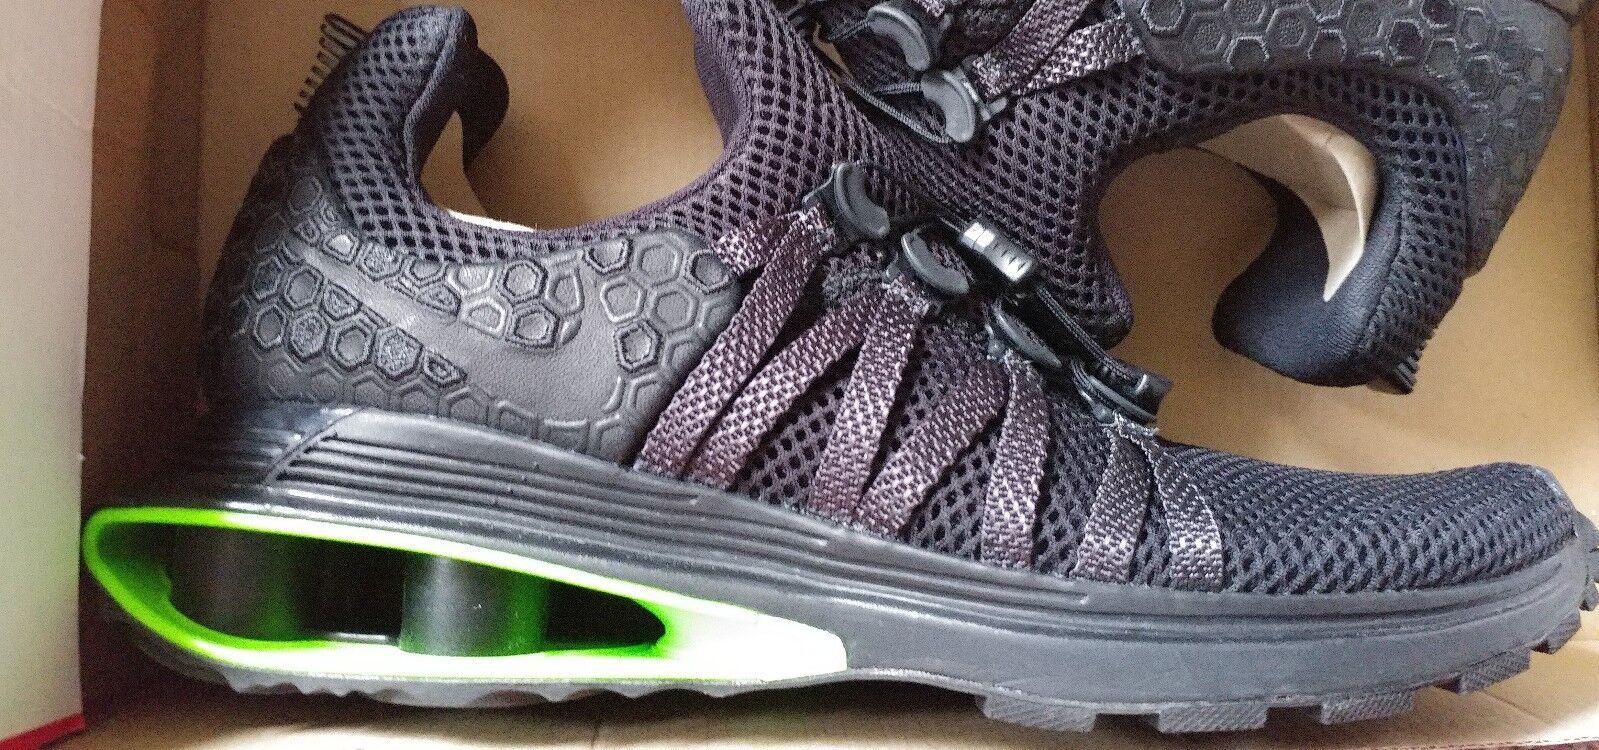 Nike schwarze shox schwerkraft luxe mitglied exklusive ltd ds schwarze Nike männer frauen 8,5 ar1470003. f899b4